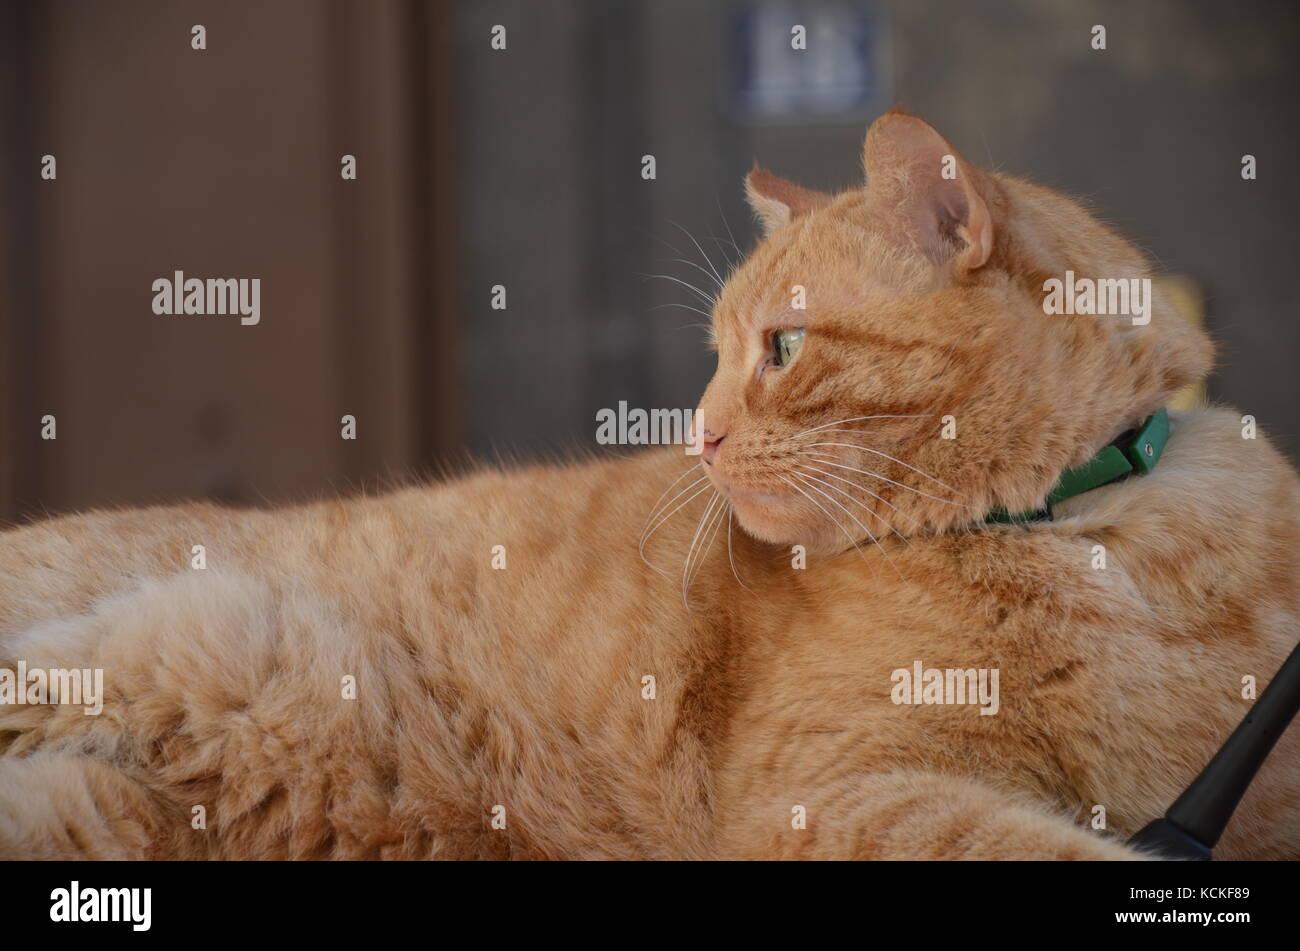 Sassy Cat Looking Away - Stock Image